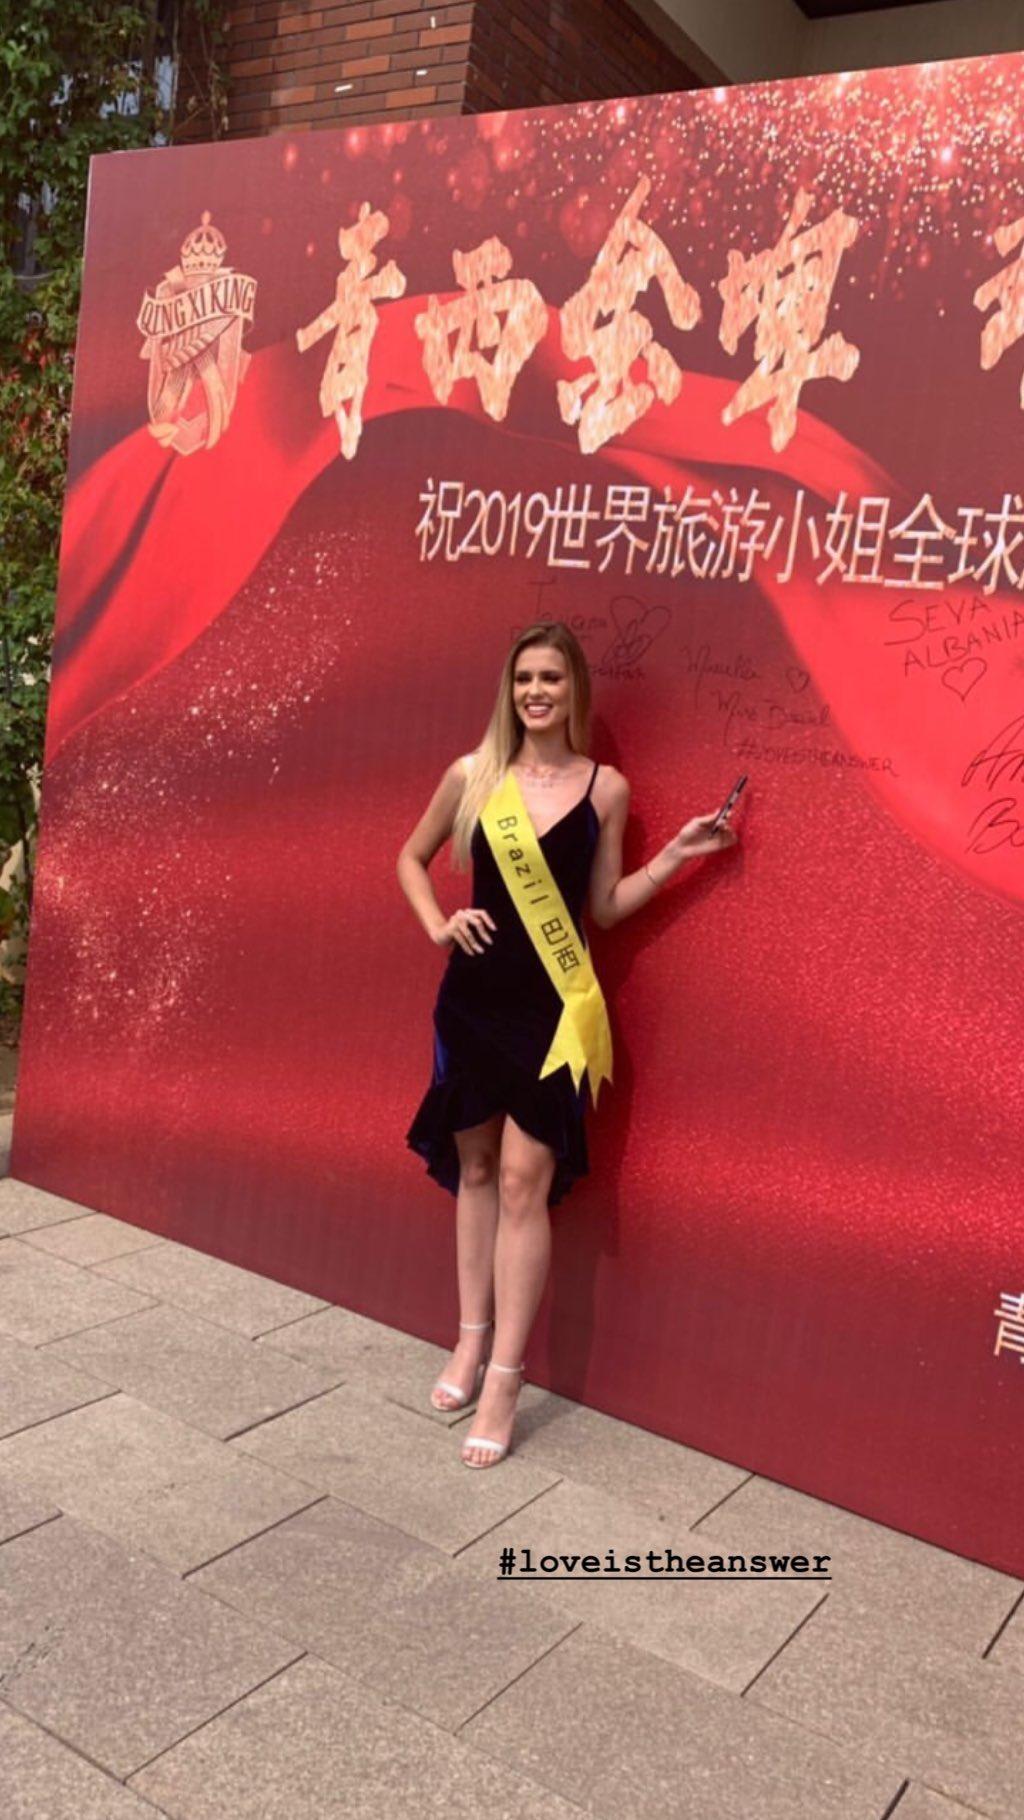 marcella kozinski de barros, 3rd runner-up de miss tourism world 2019. - Página 5 71173010